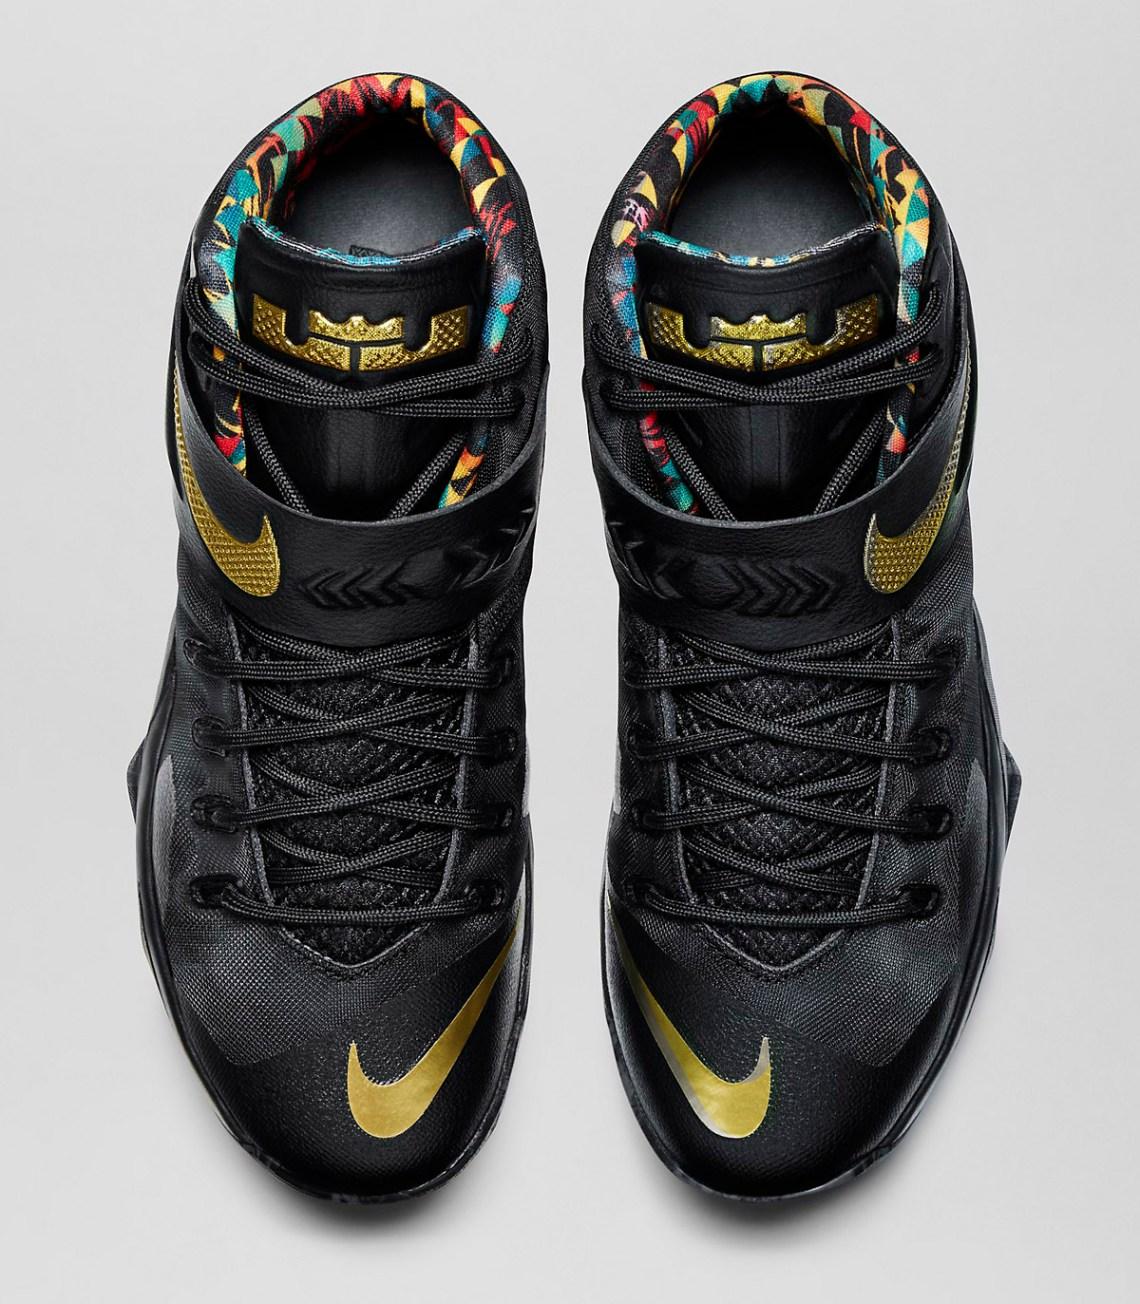 847d5208eb477 Nike LeBron 16